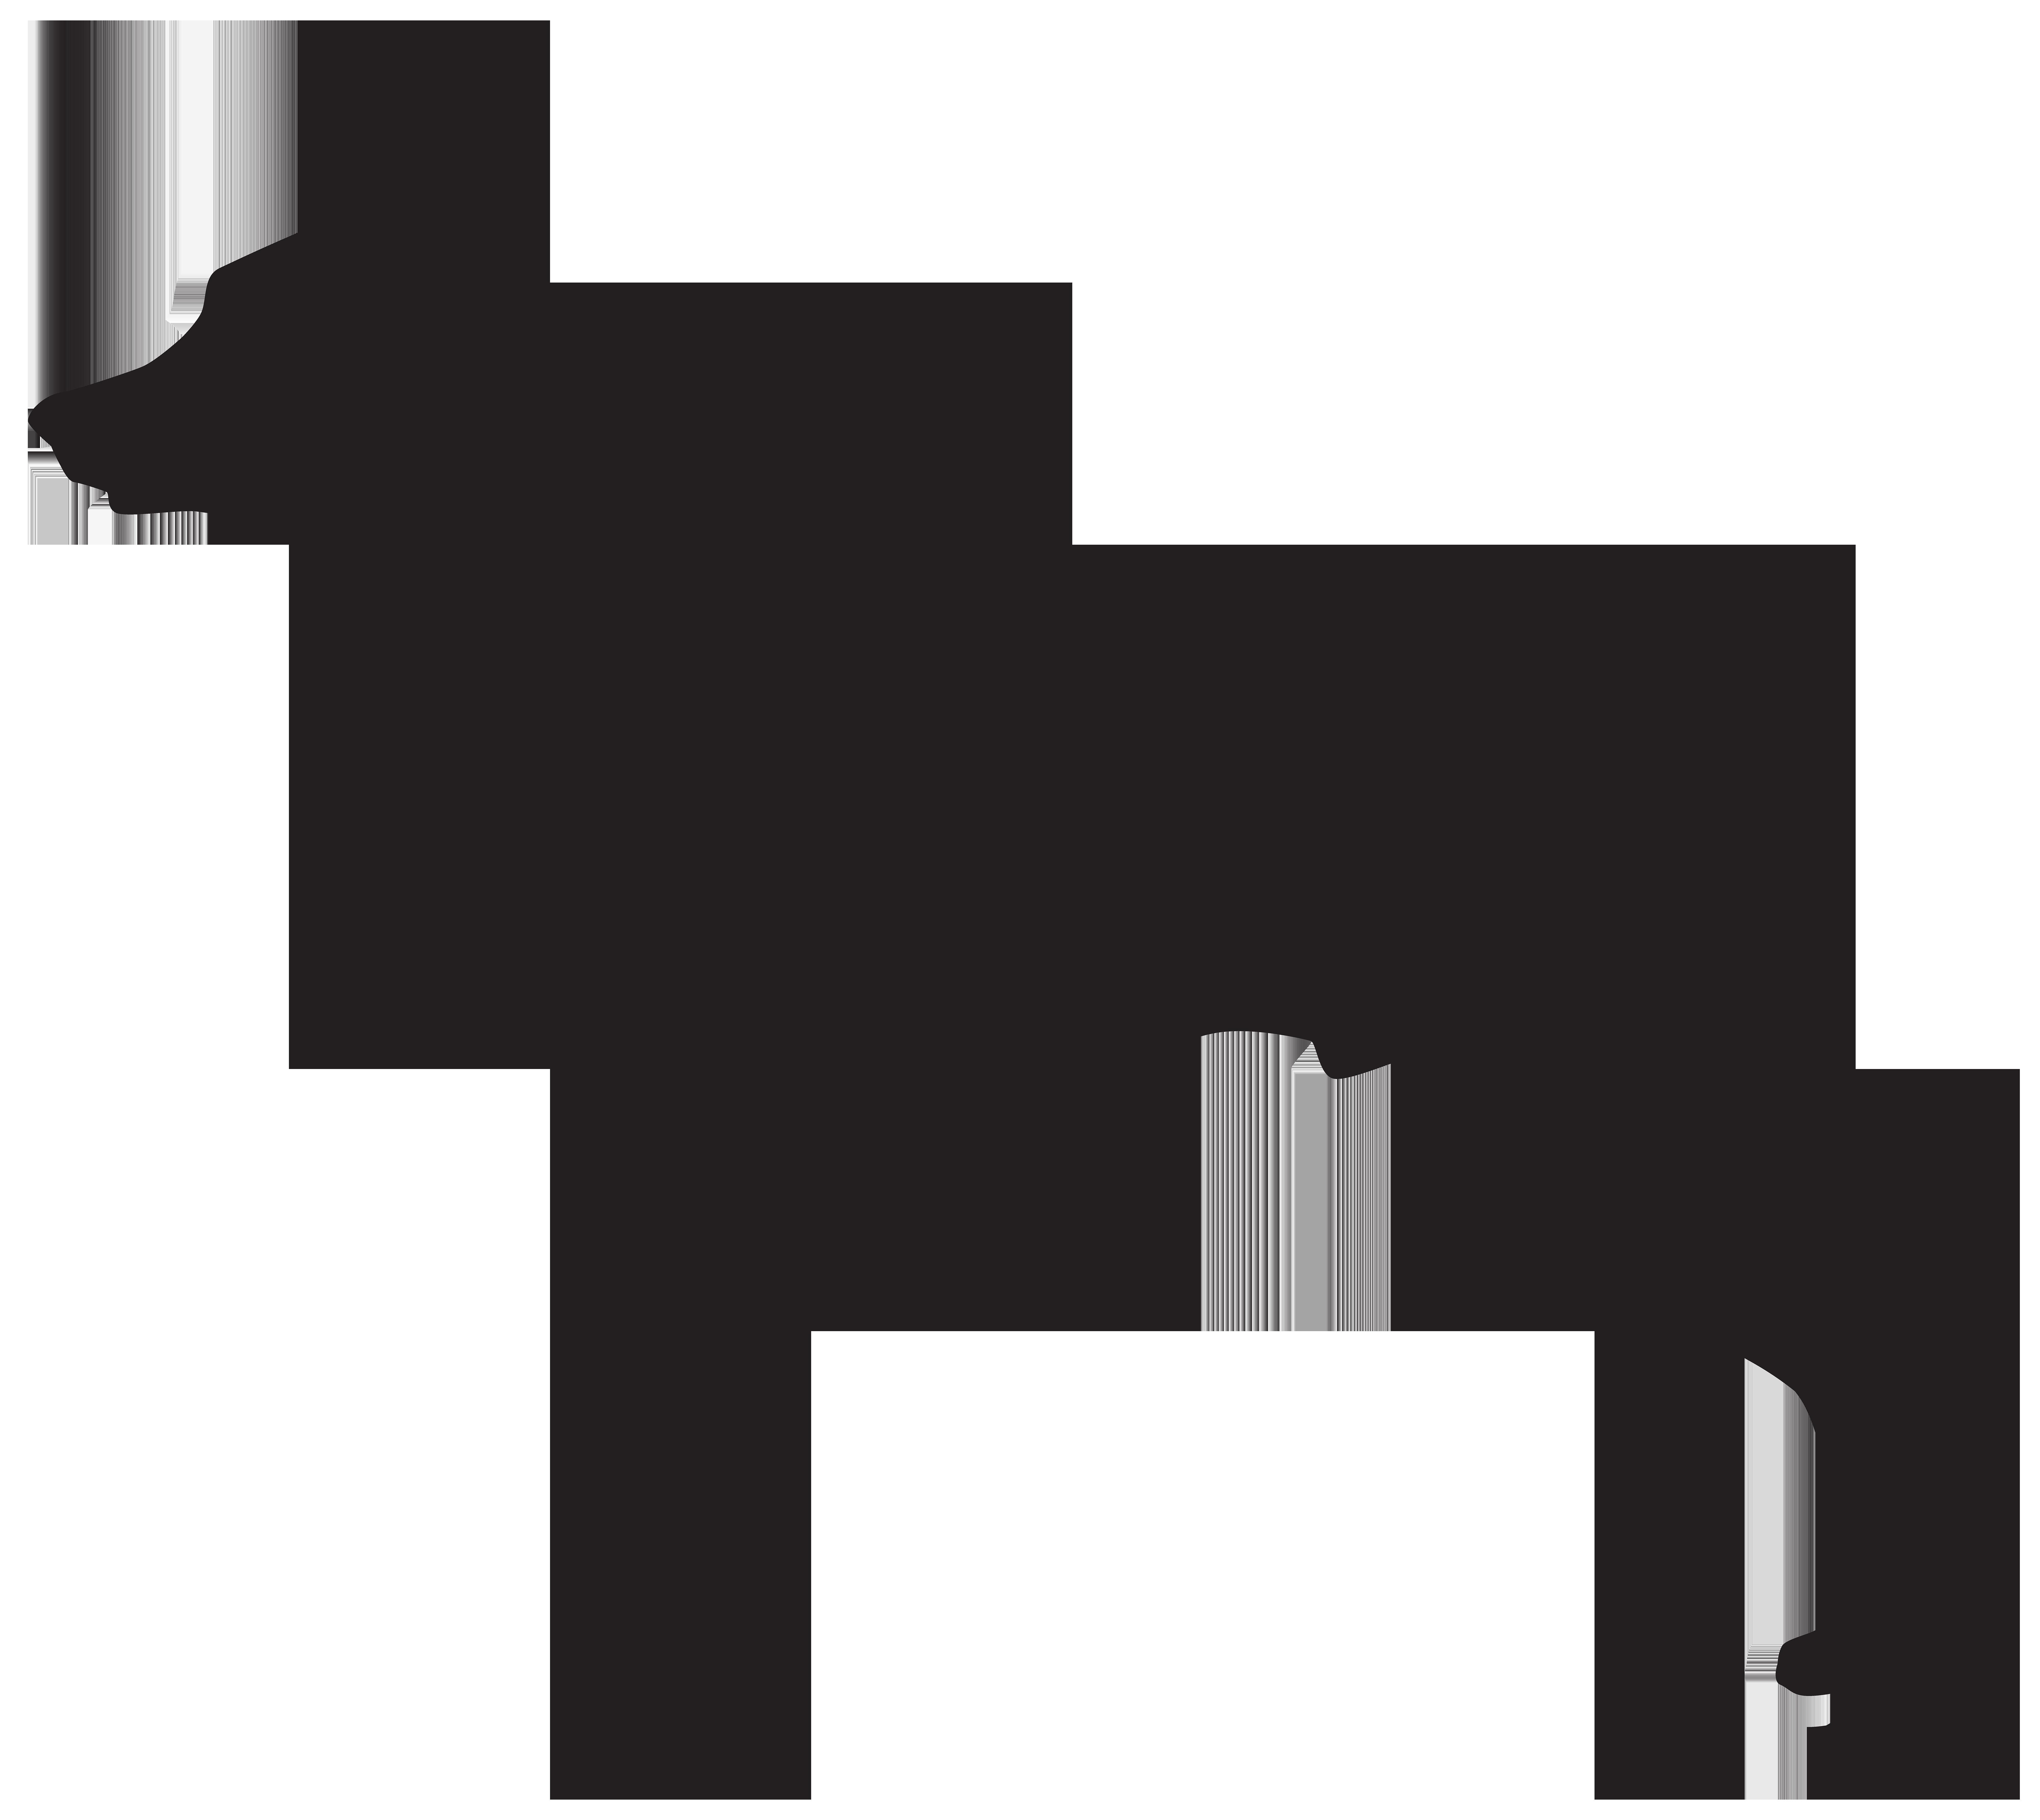 Clipart doberman jpg stock Doberman Dog Silhouette PNG Transparent Clip Art Image | Gallery ... jpg stock